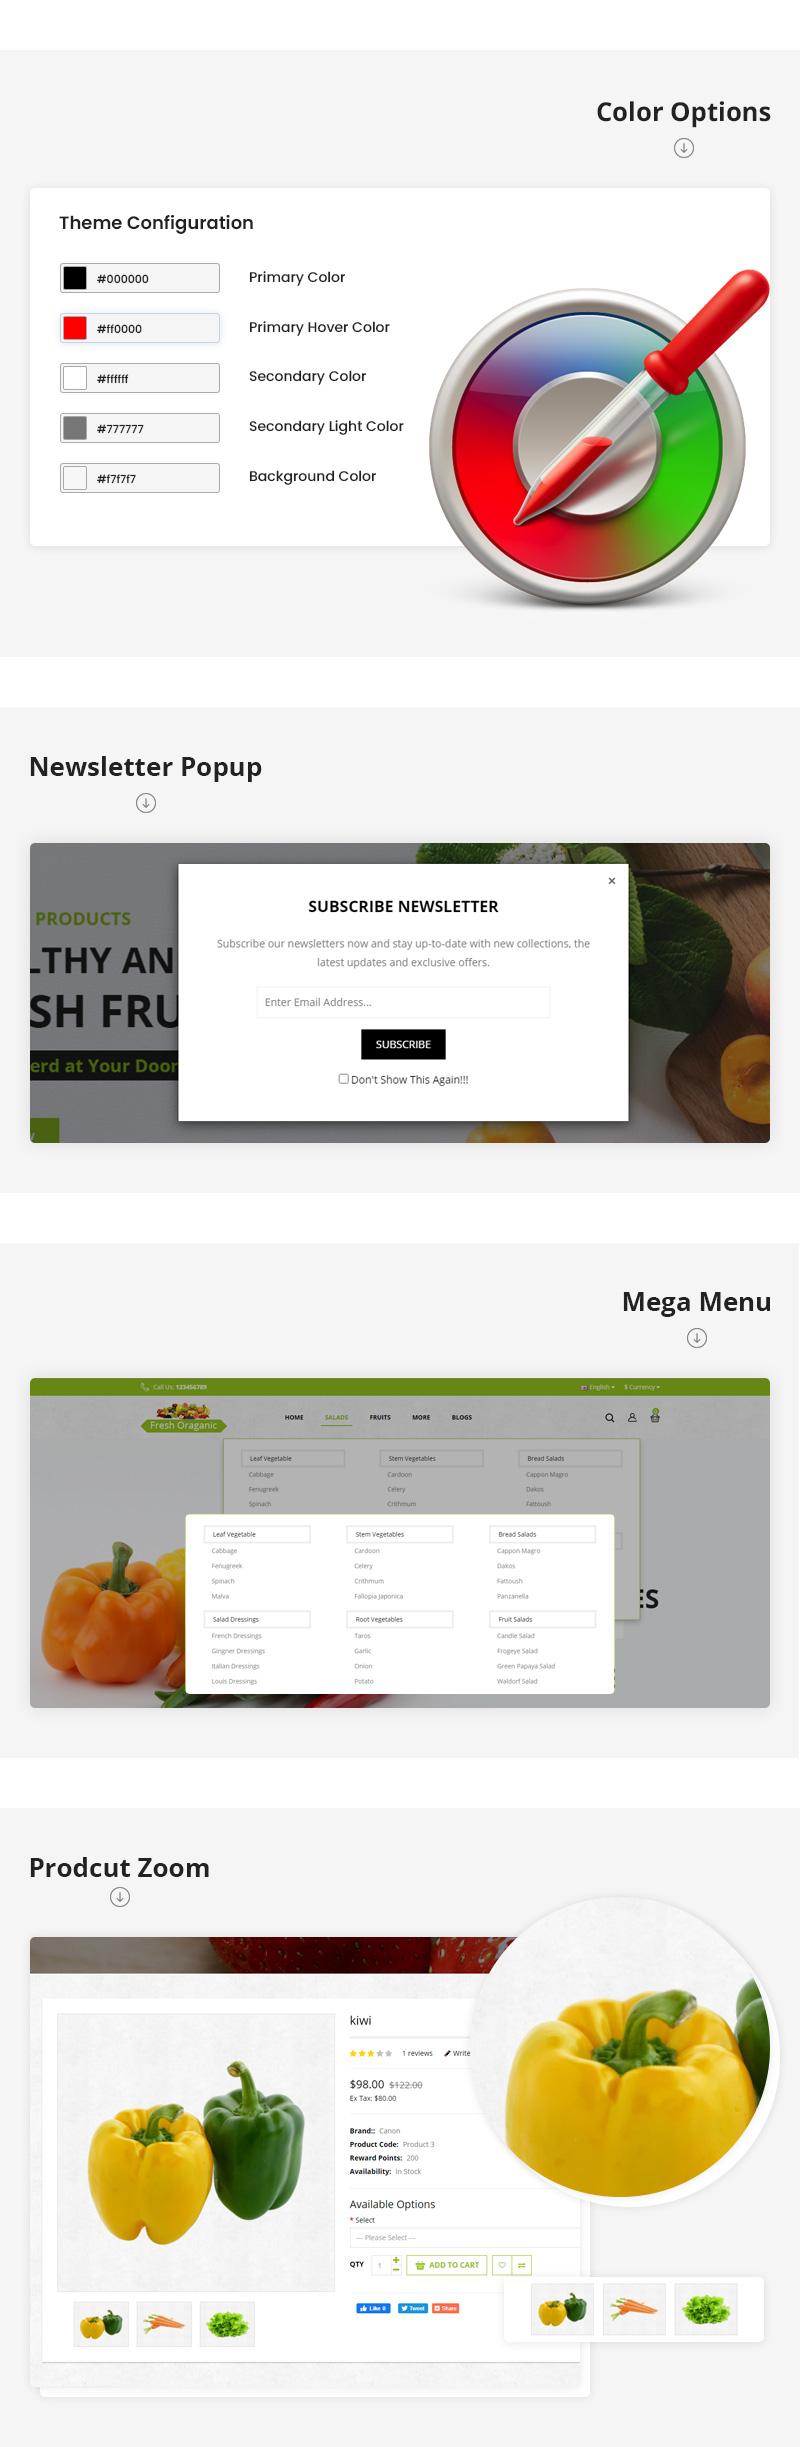 fresh-organic-features-3.jpg